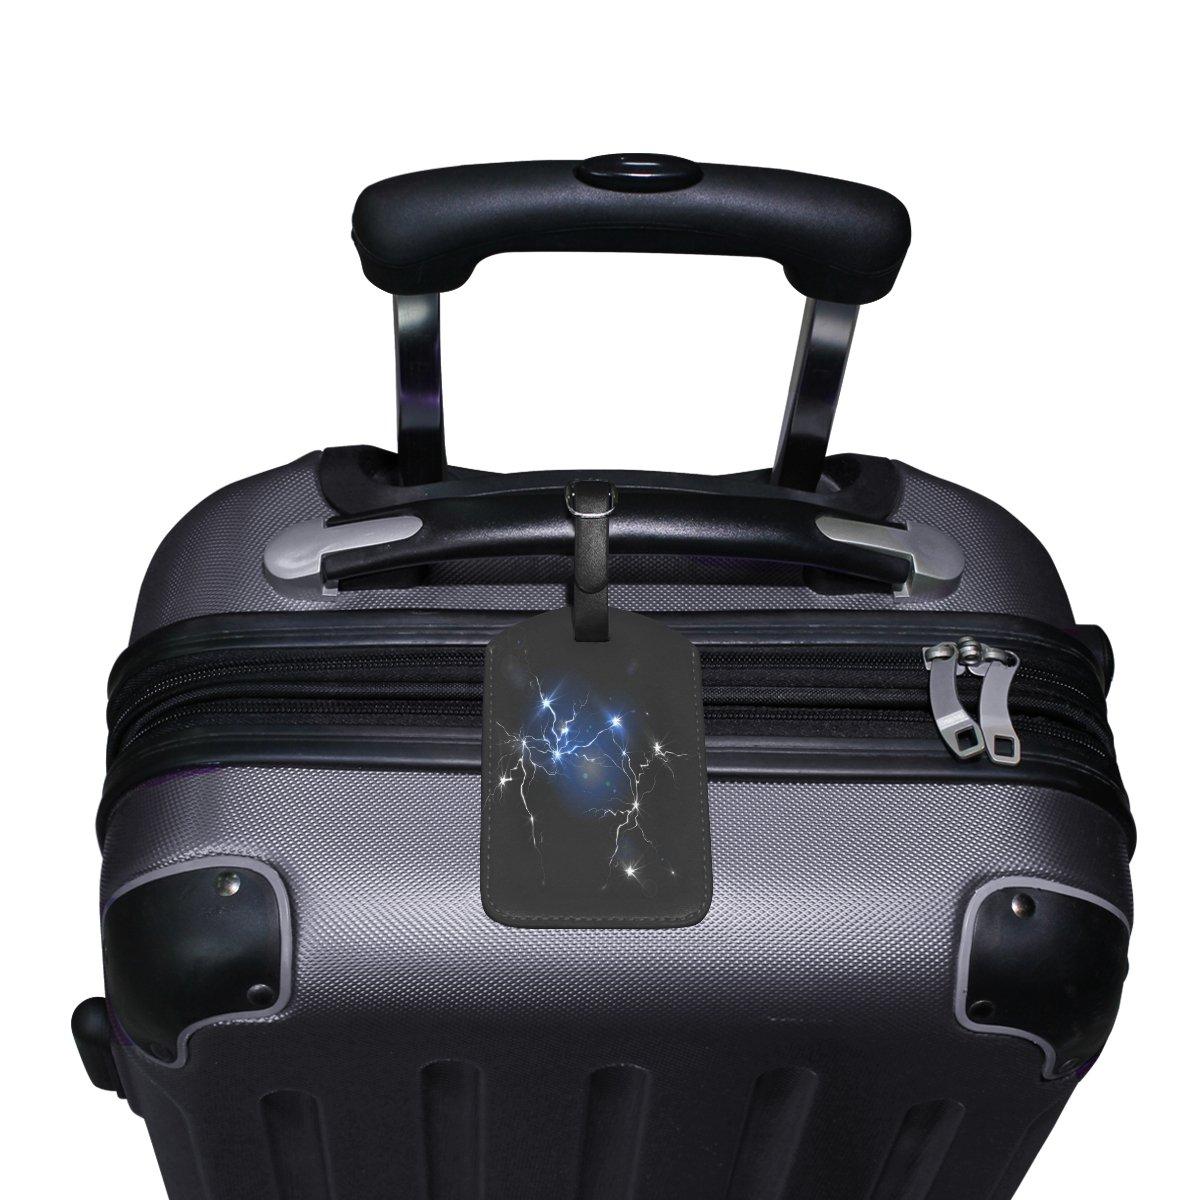 Saobao Travel Luggage Tag Cartoon Lightning PU Leather Baggage Suitcase Travel ID Bag Tag 1Pcs